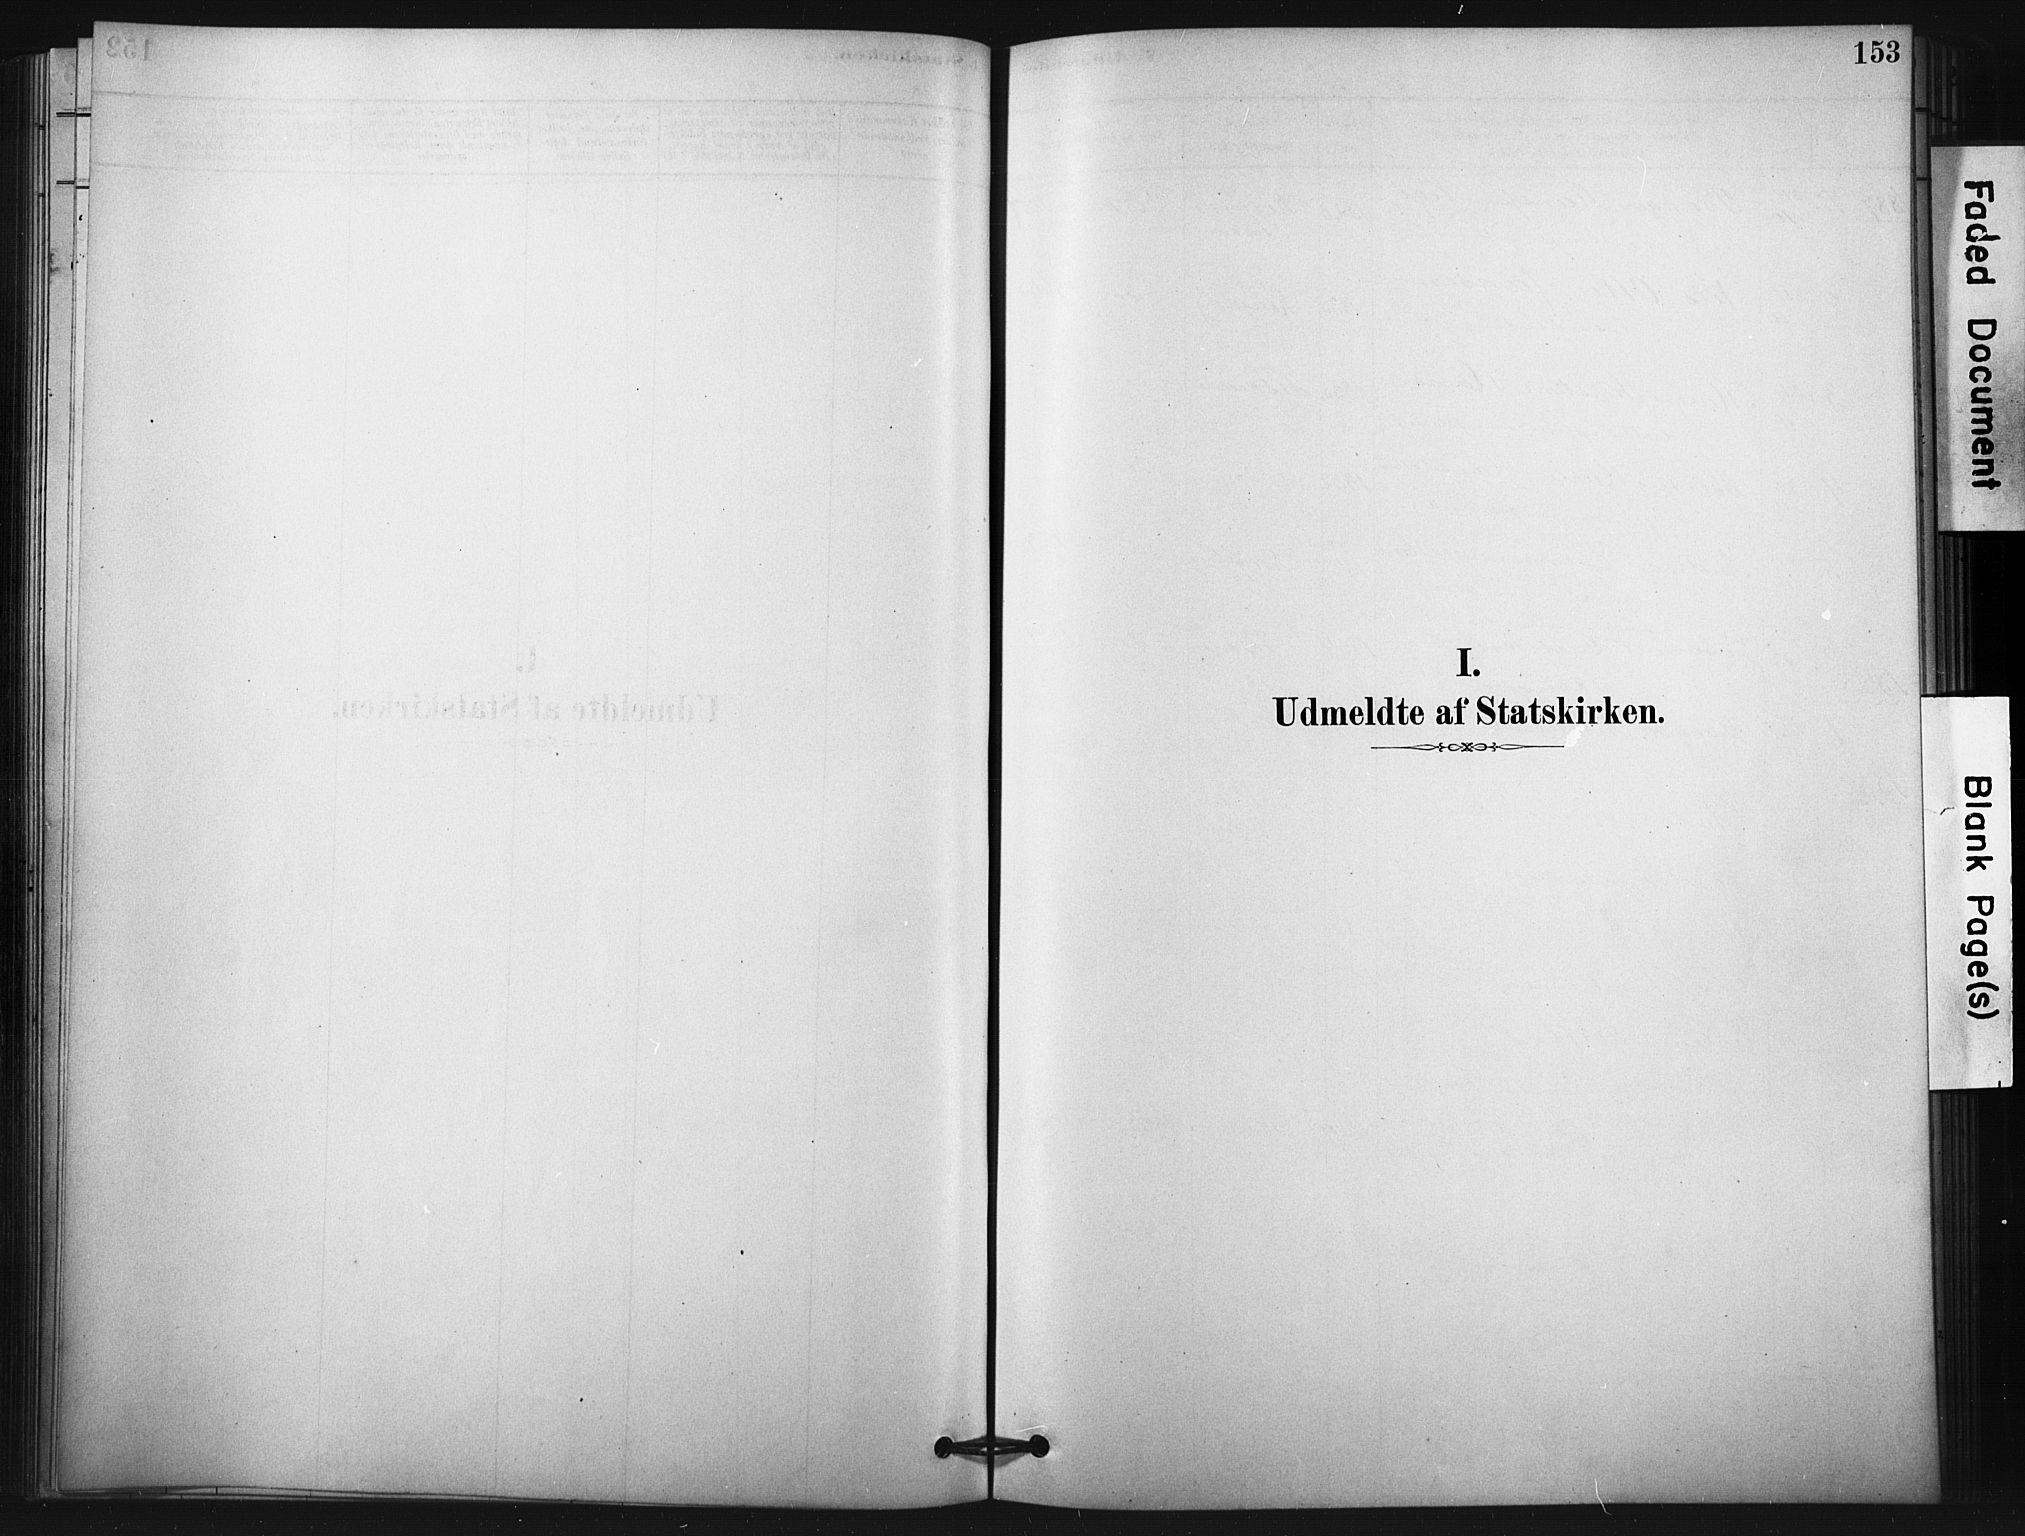 SAKO, Fiskum kirkebøker, F/Fa/L0002: Ministerialbok nr. 2, 1878-1890, s. 153